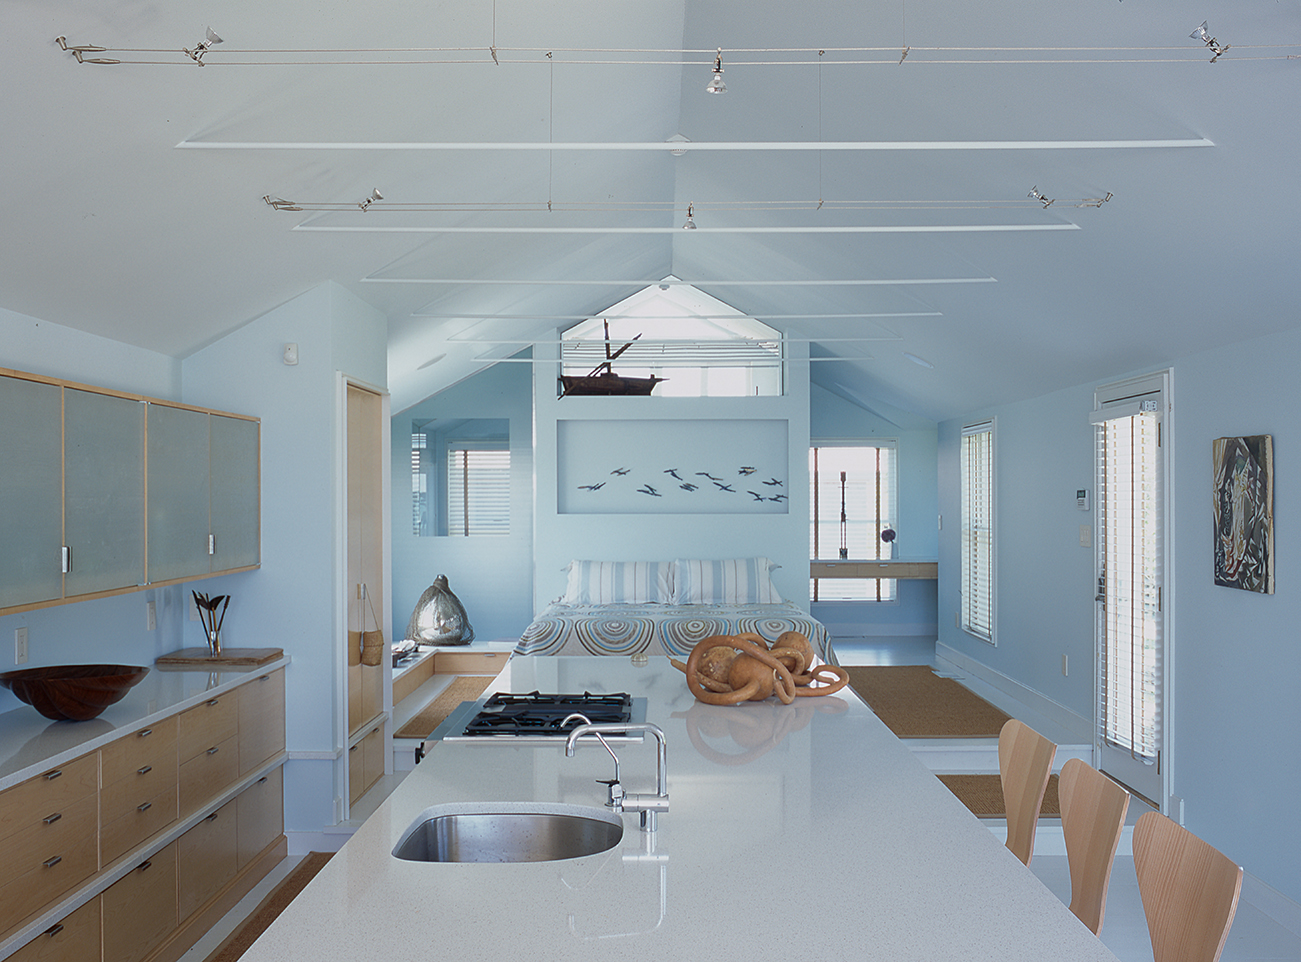 luis-pons-design-interior-house-East-Hampton-NY_8.jpg